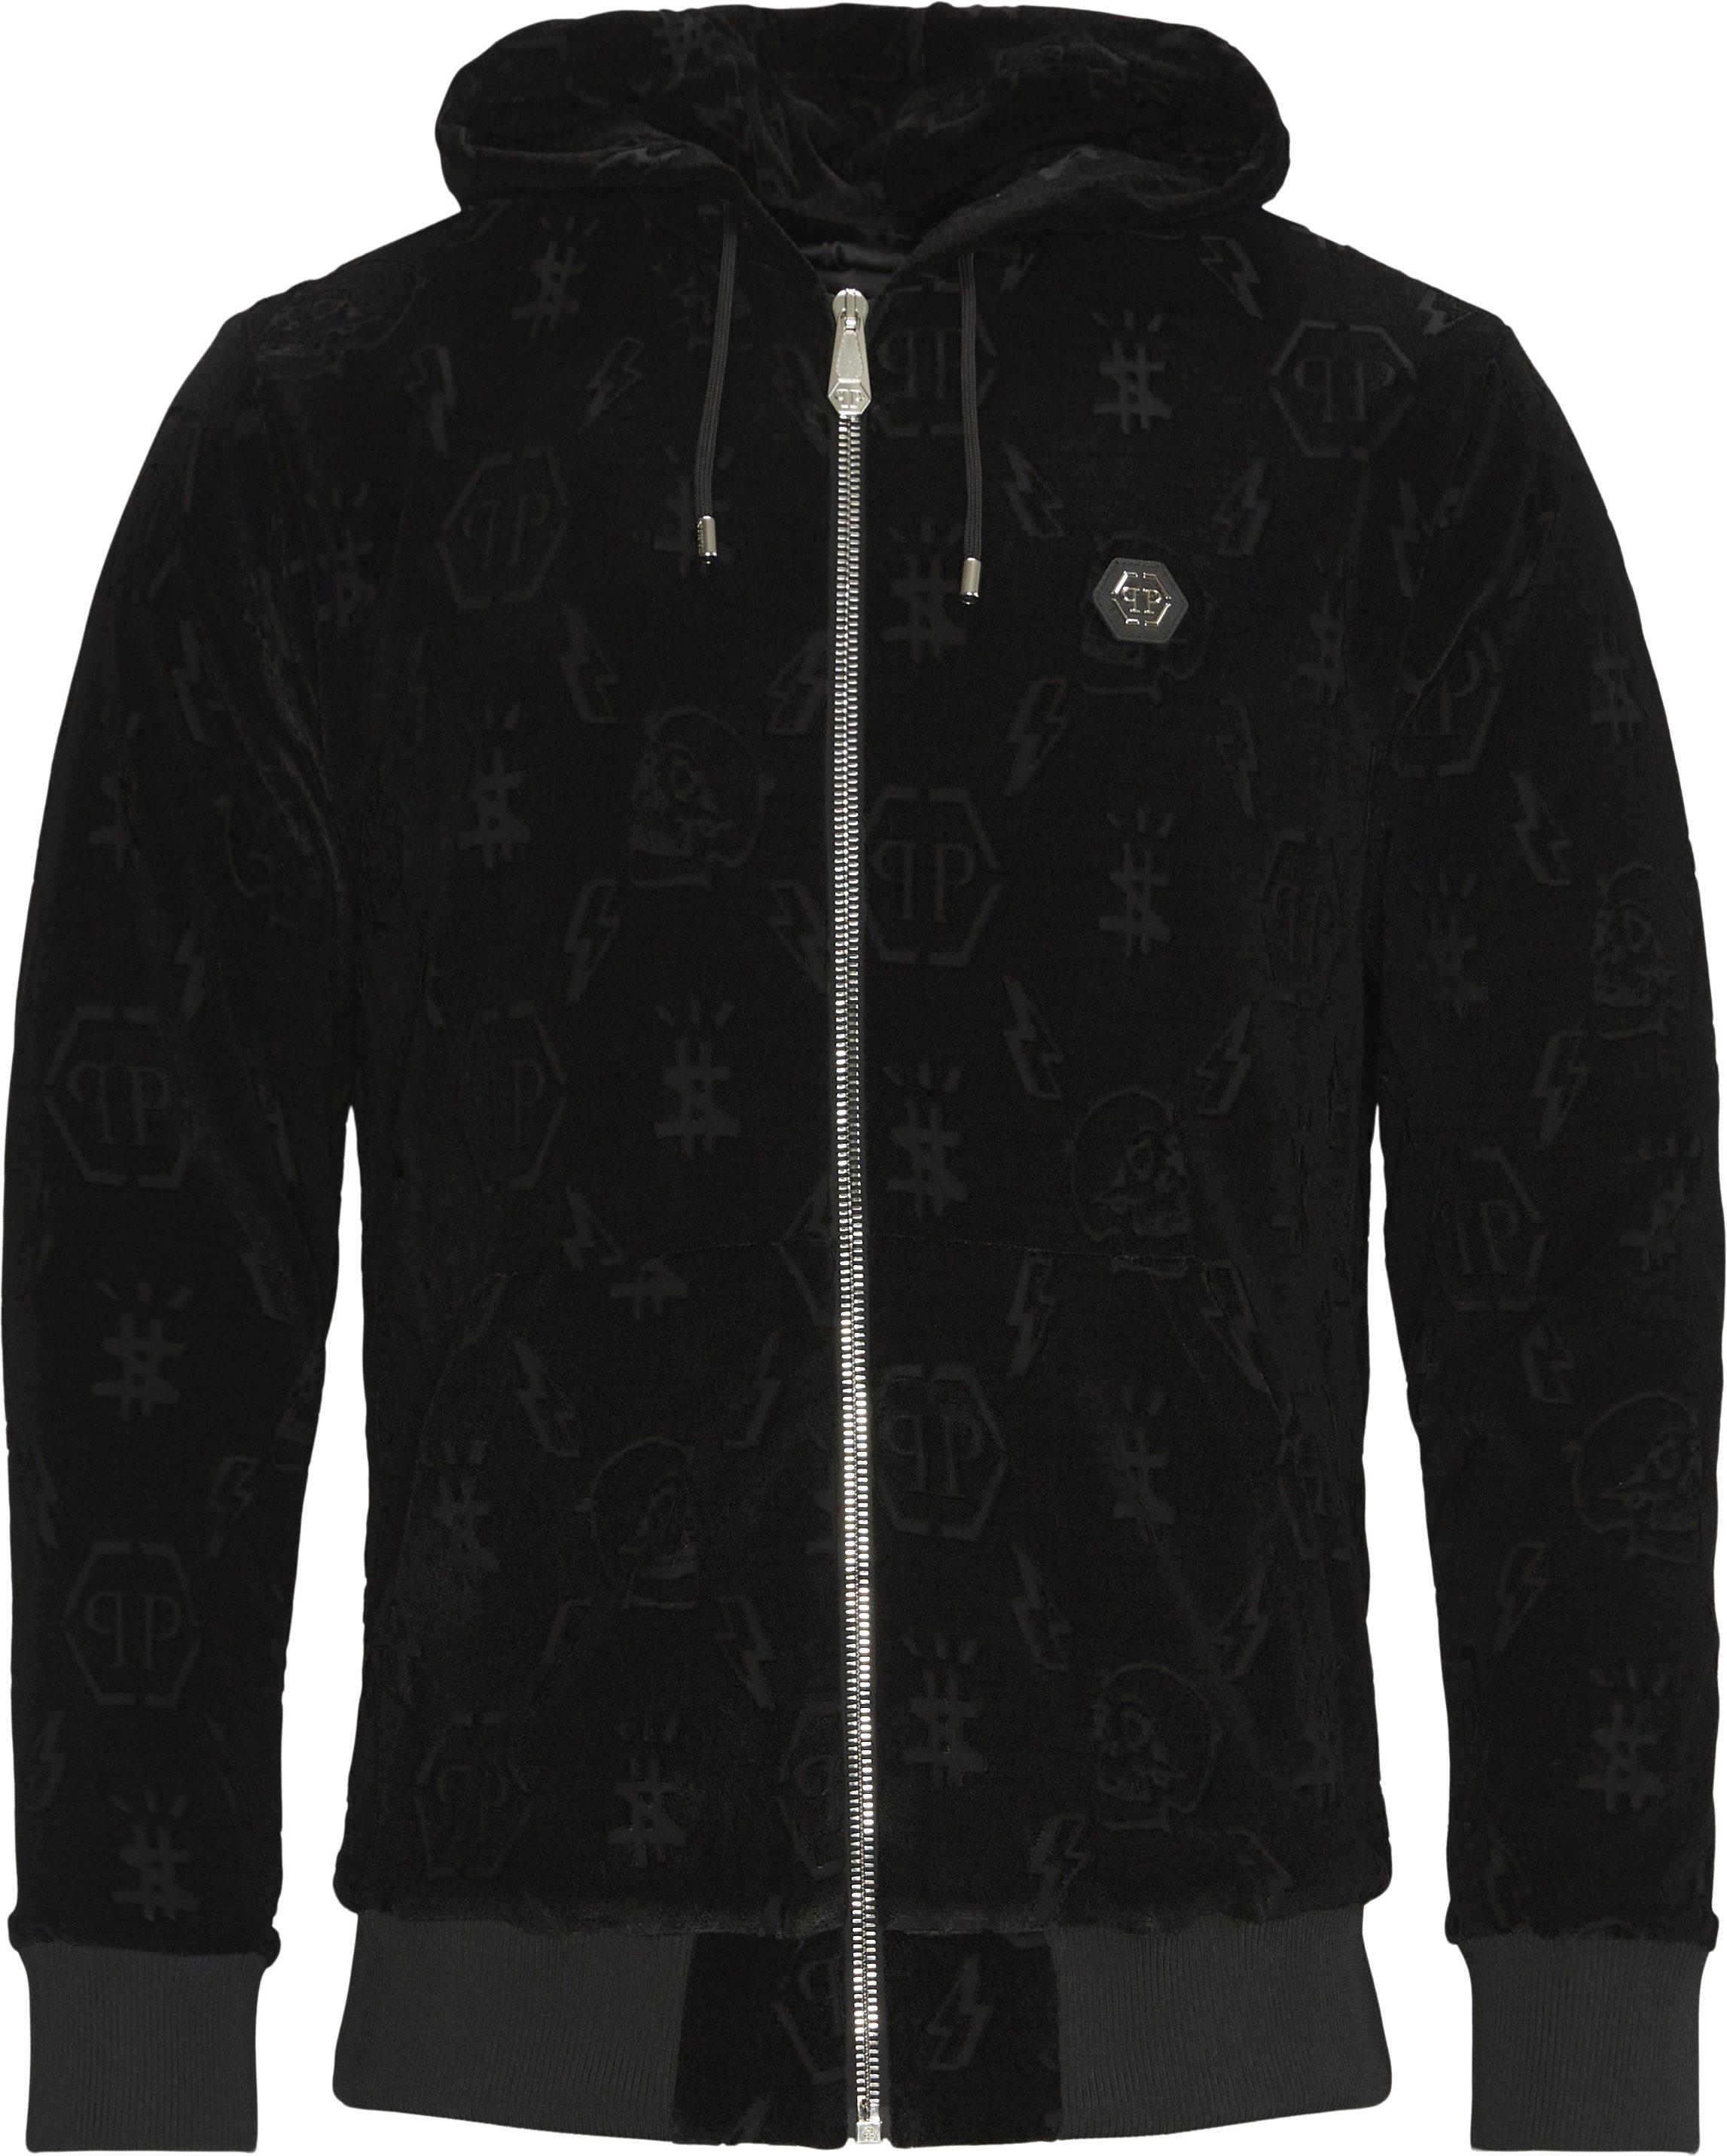 Hoodie Sweatjacket Monogram - Sweatshirts - Regular fit - Sort